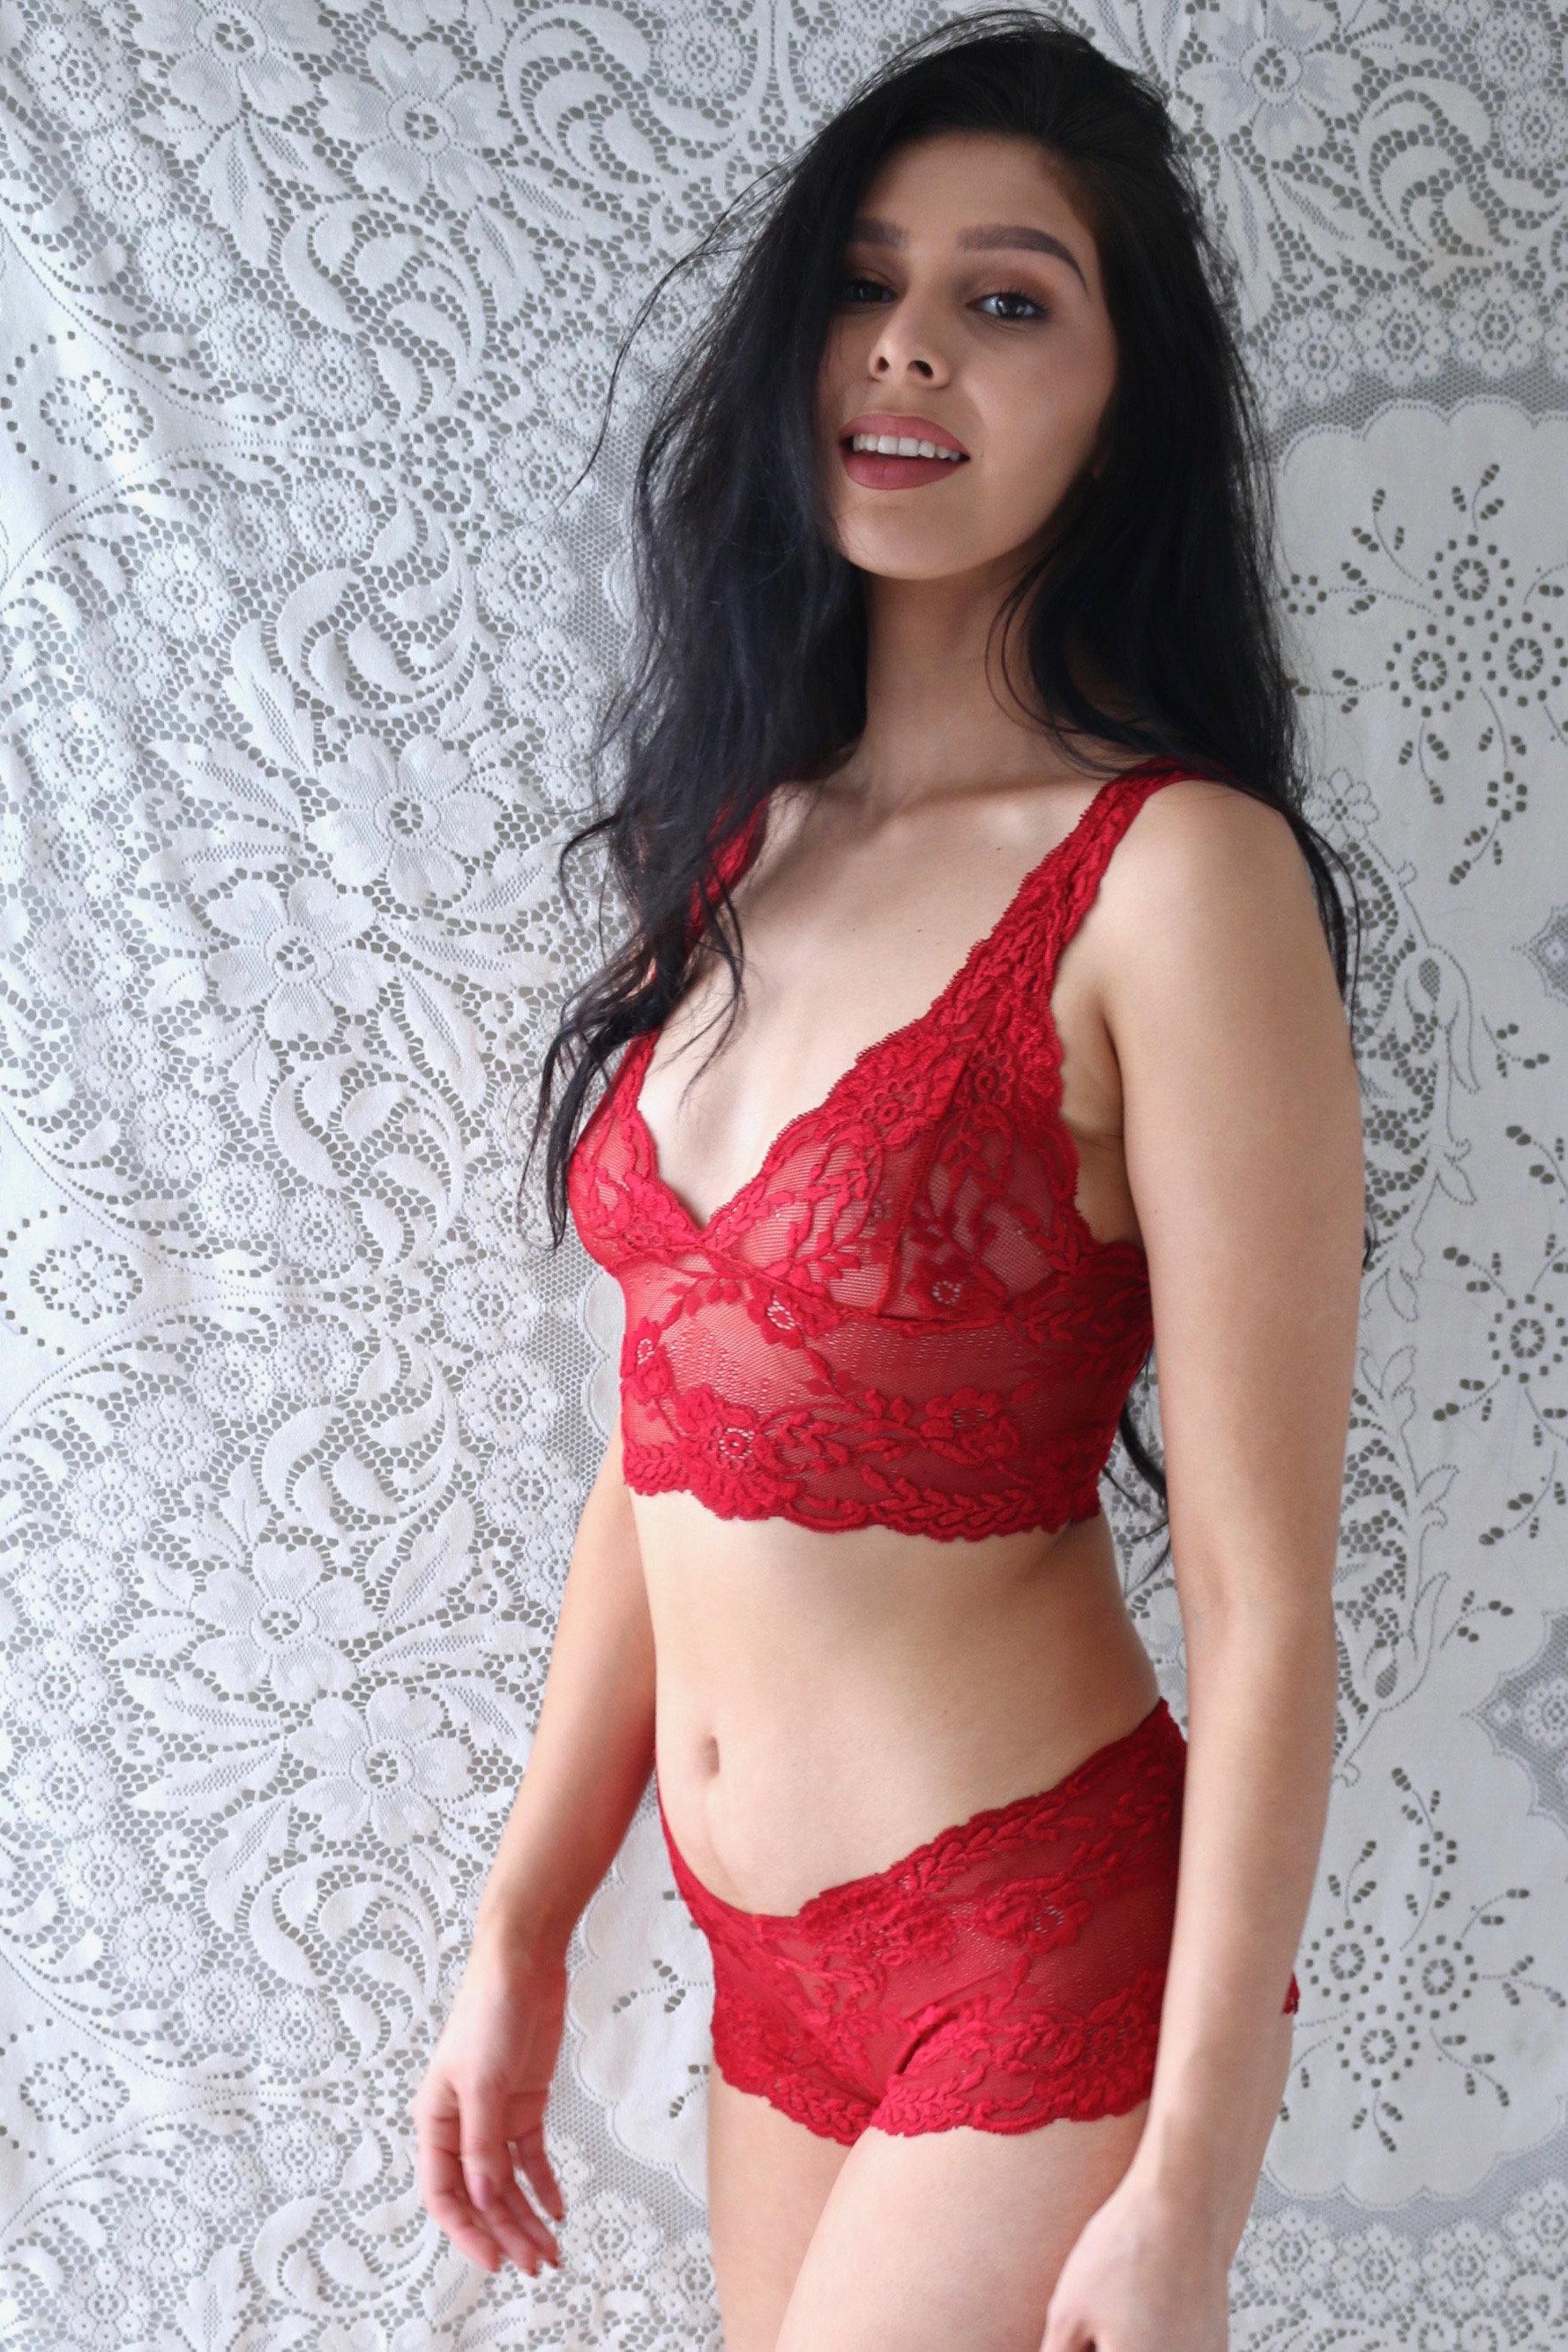 5bba9ab69b705 Lingerie Set Red Lace Bralette Set Sheer Lingerie Lace | Etsy